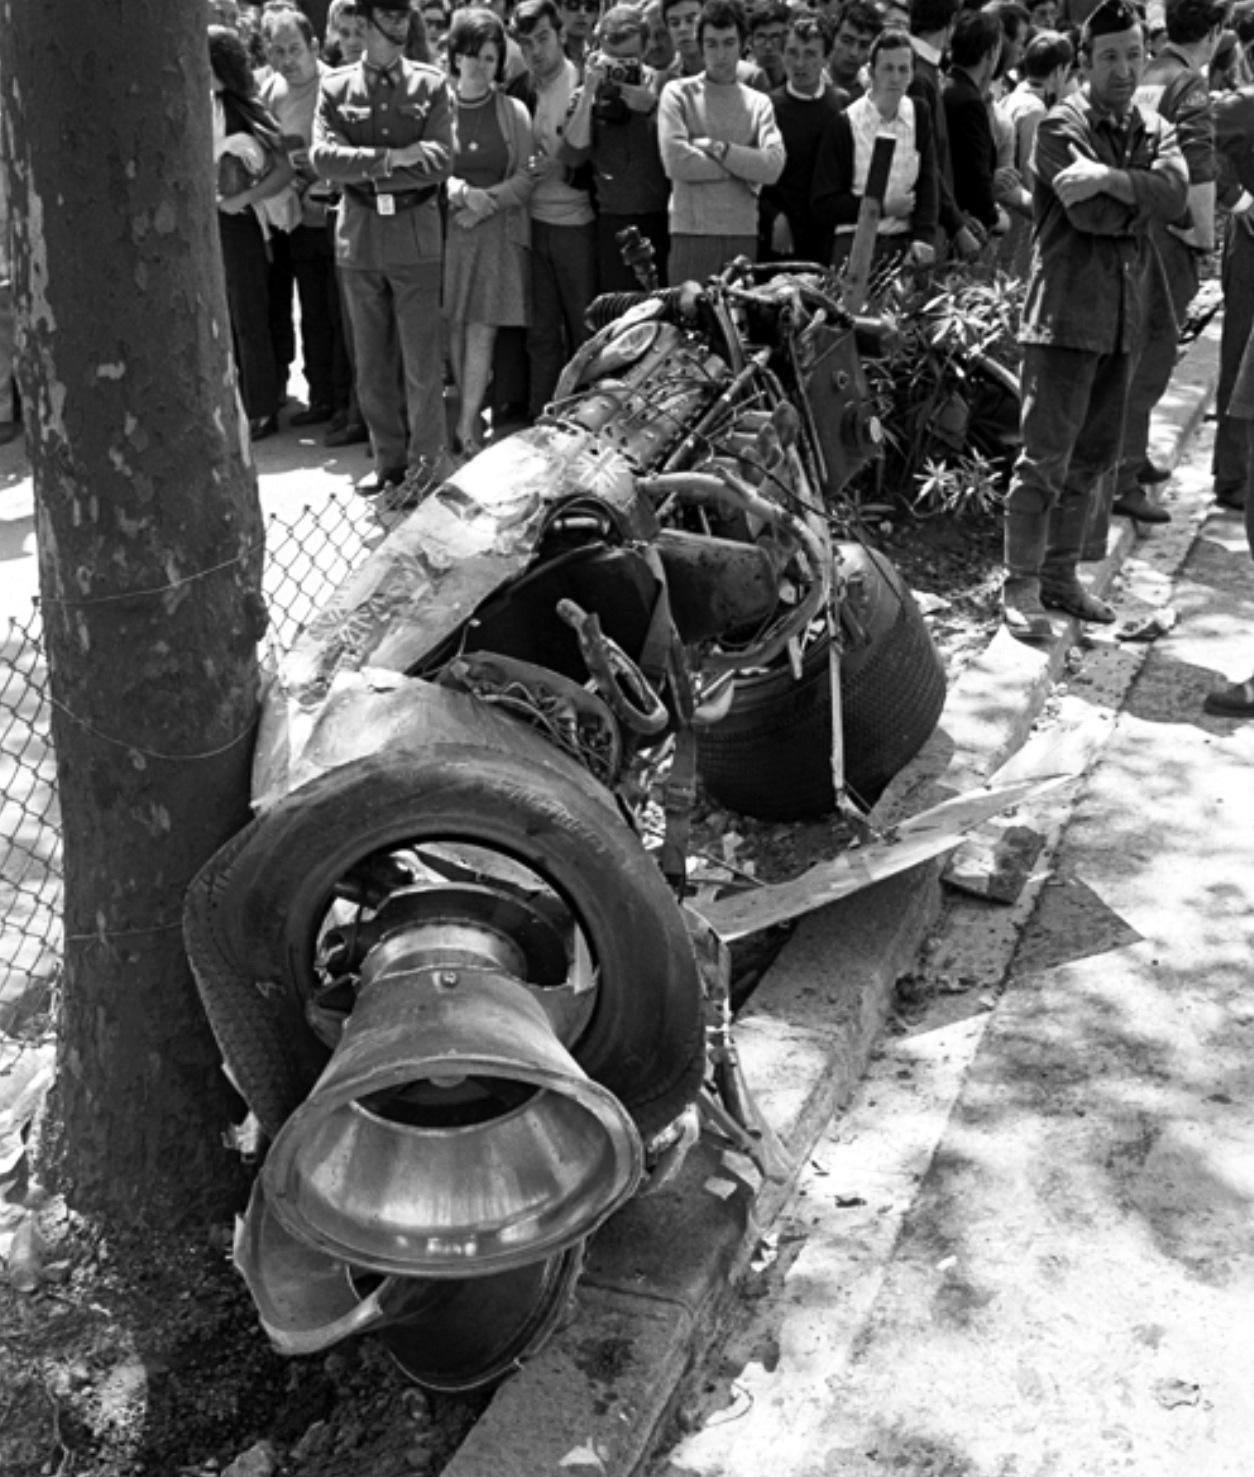 1969 Restos Del Lotus 49b Ford Cosworth V8 De Jochen